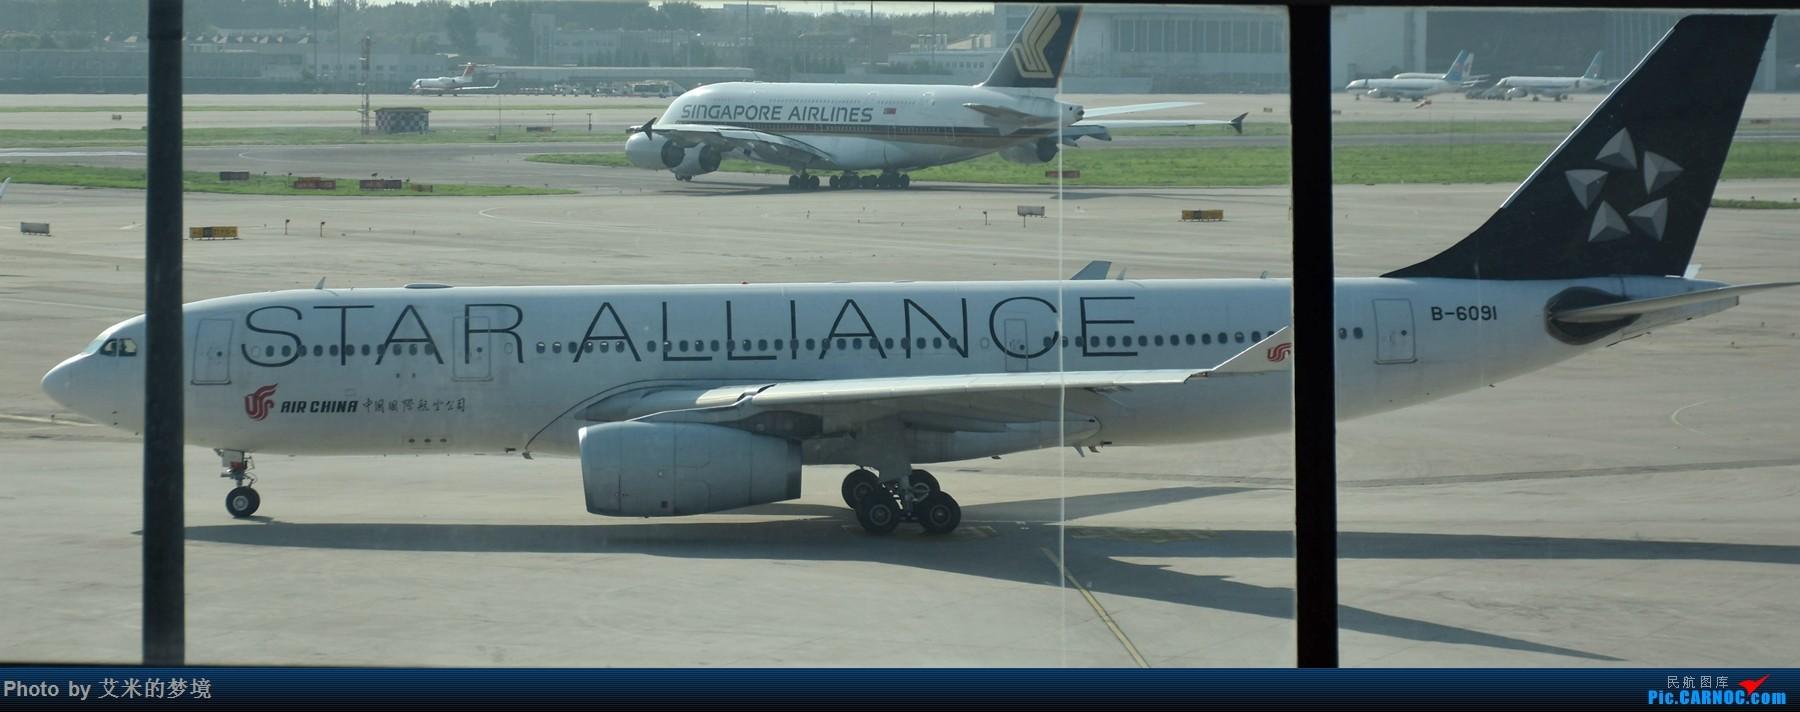 Re:[原创]【carnoc重庆飞友会】北京送行,所见飞行 AIRBUS A330-200 B-6091 中国北京首都国际机场